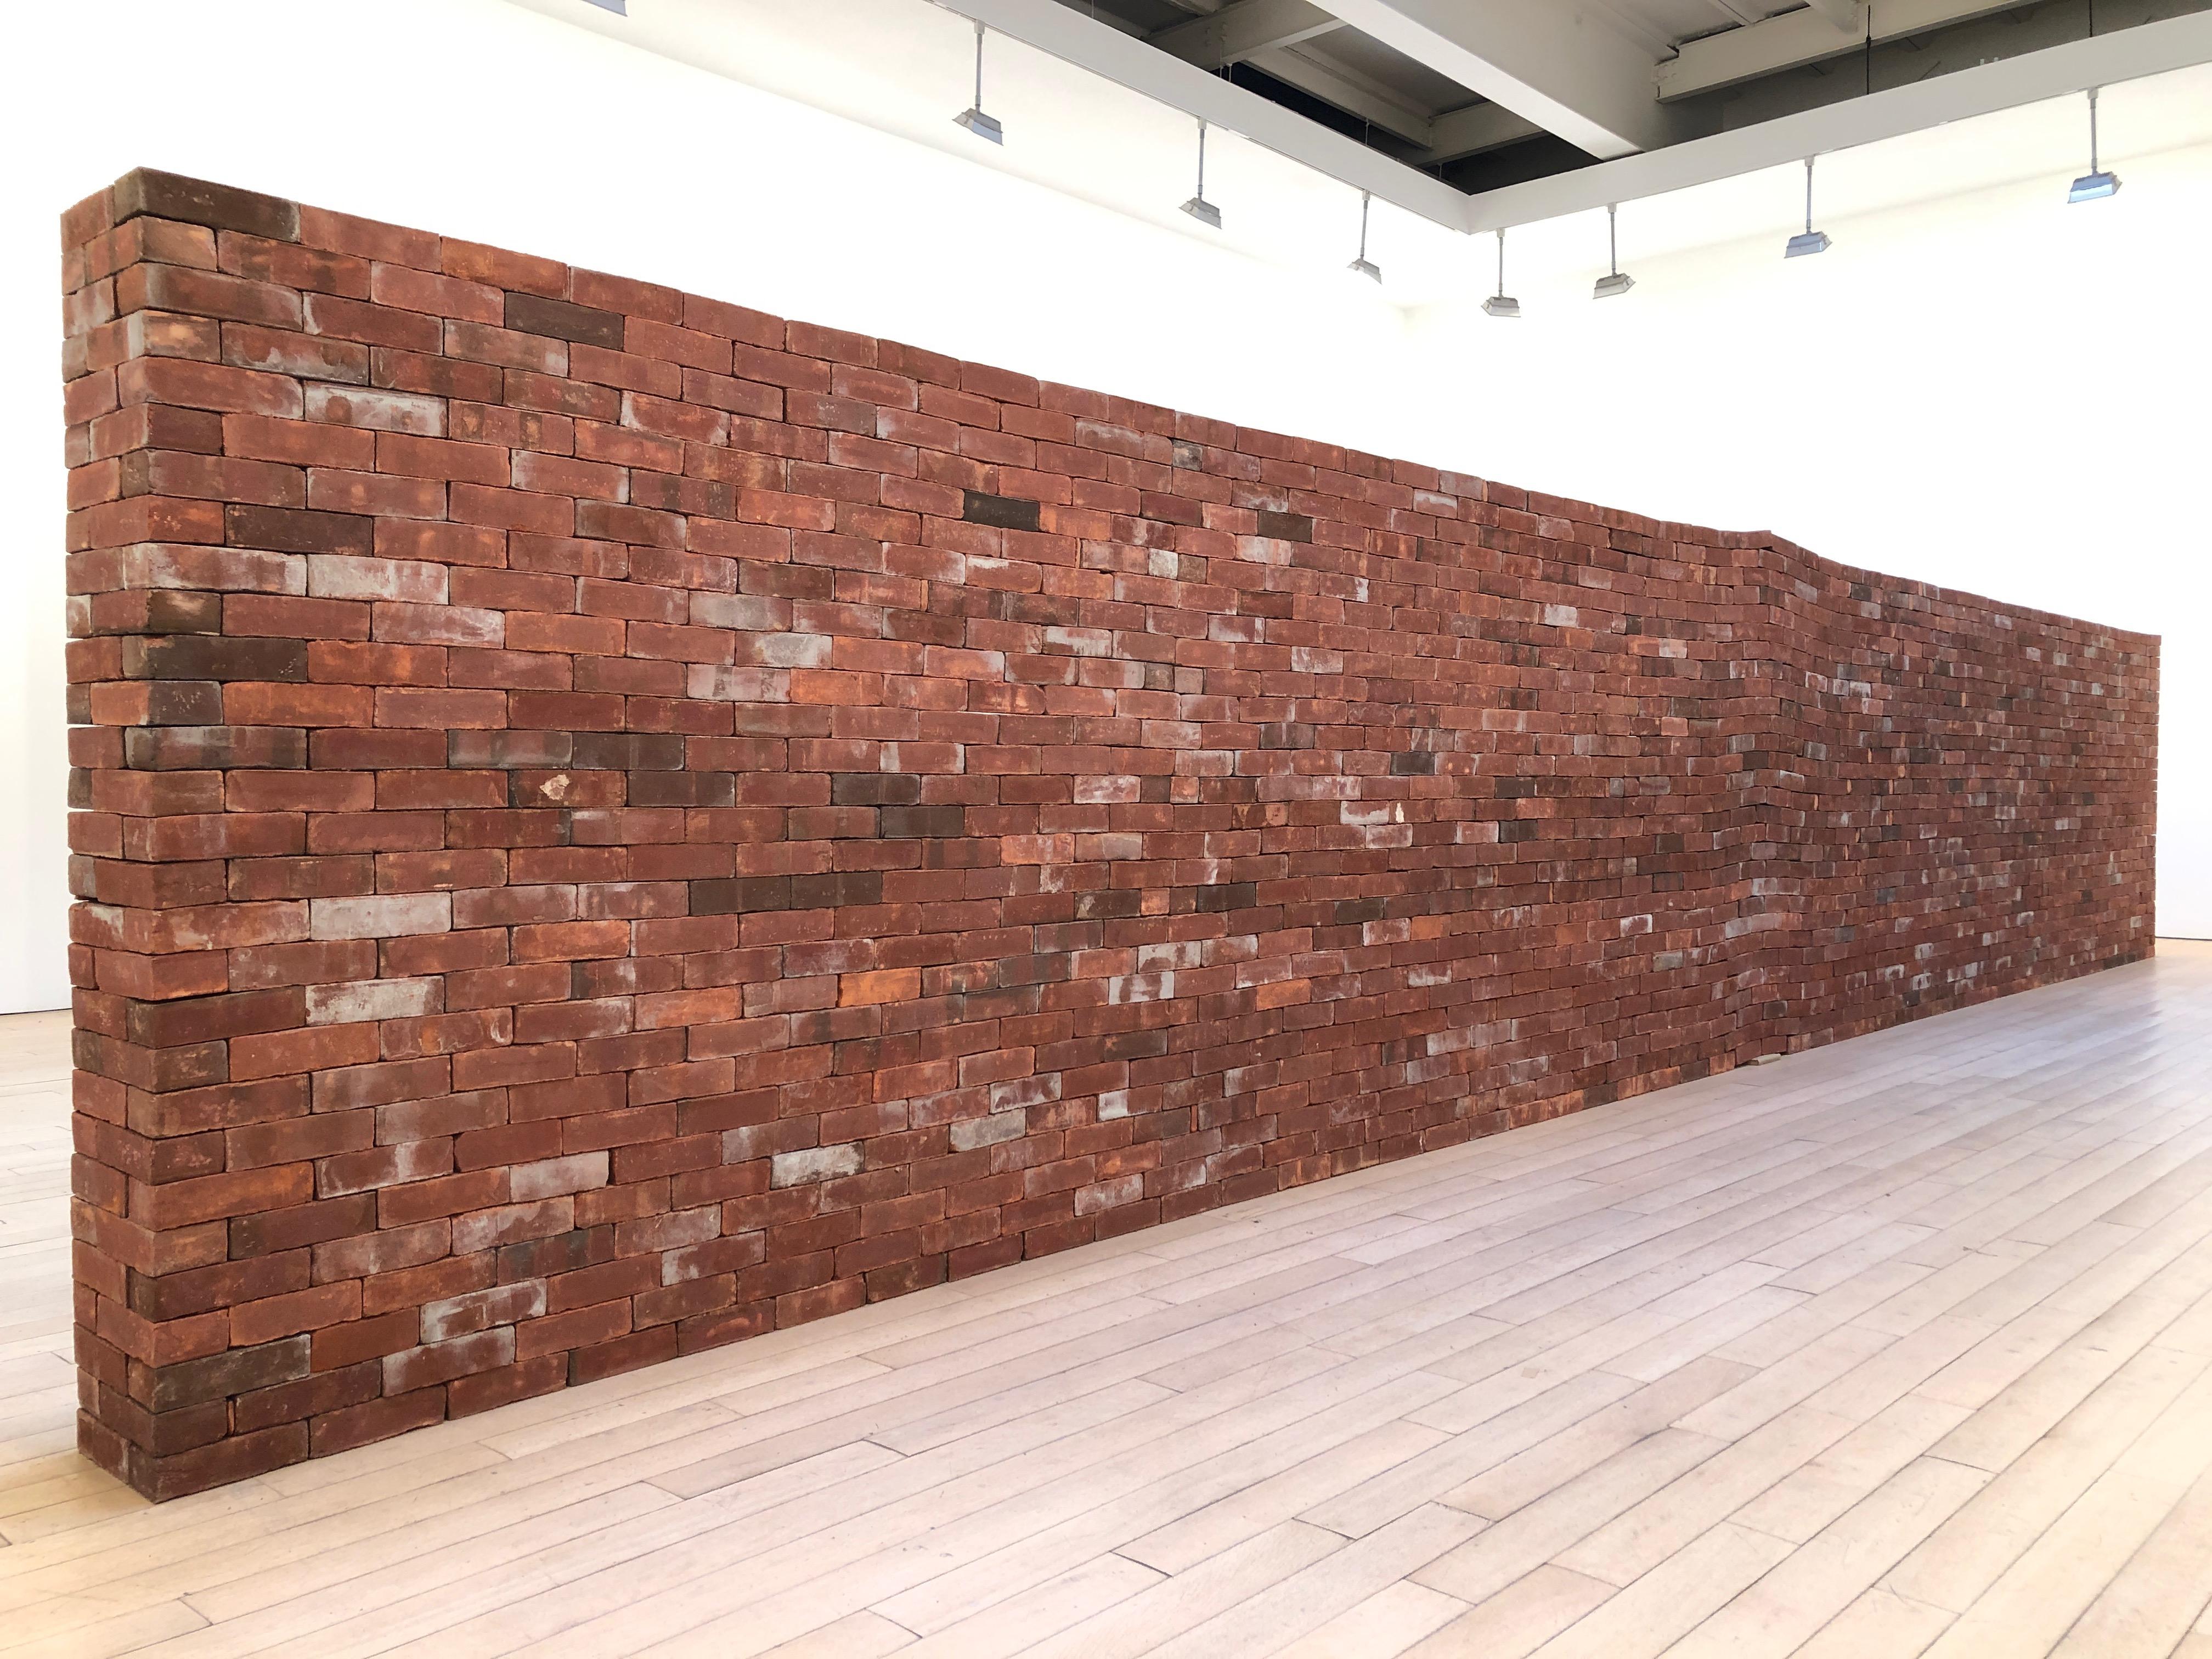 At James Cohan Gallery, Jorge Méndez Blake Builds a Wall